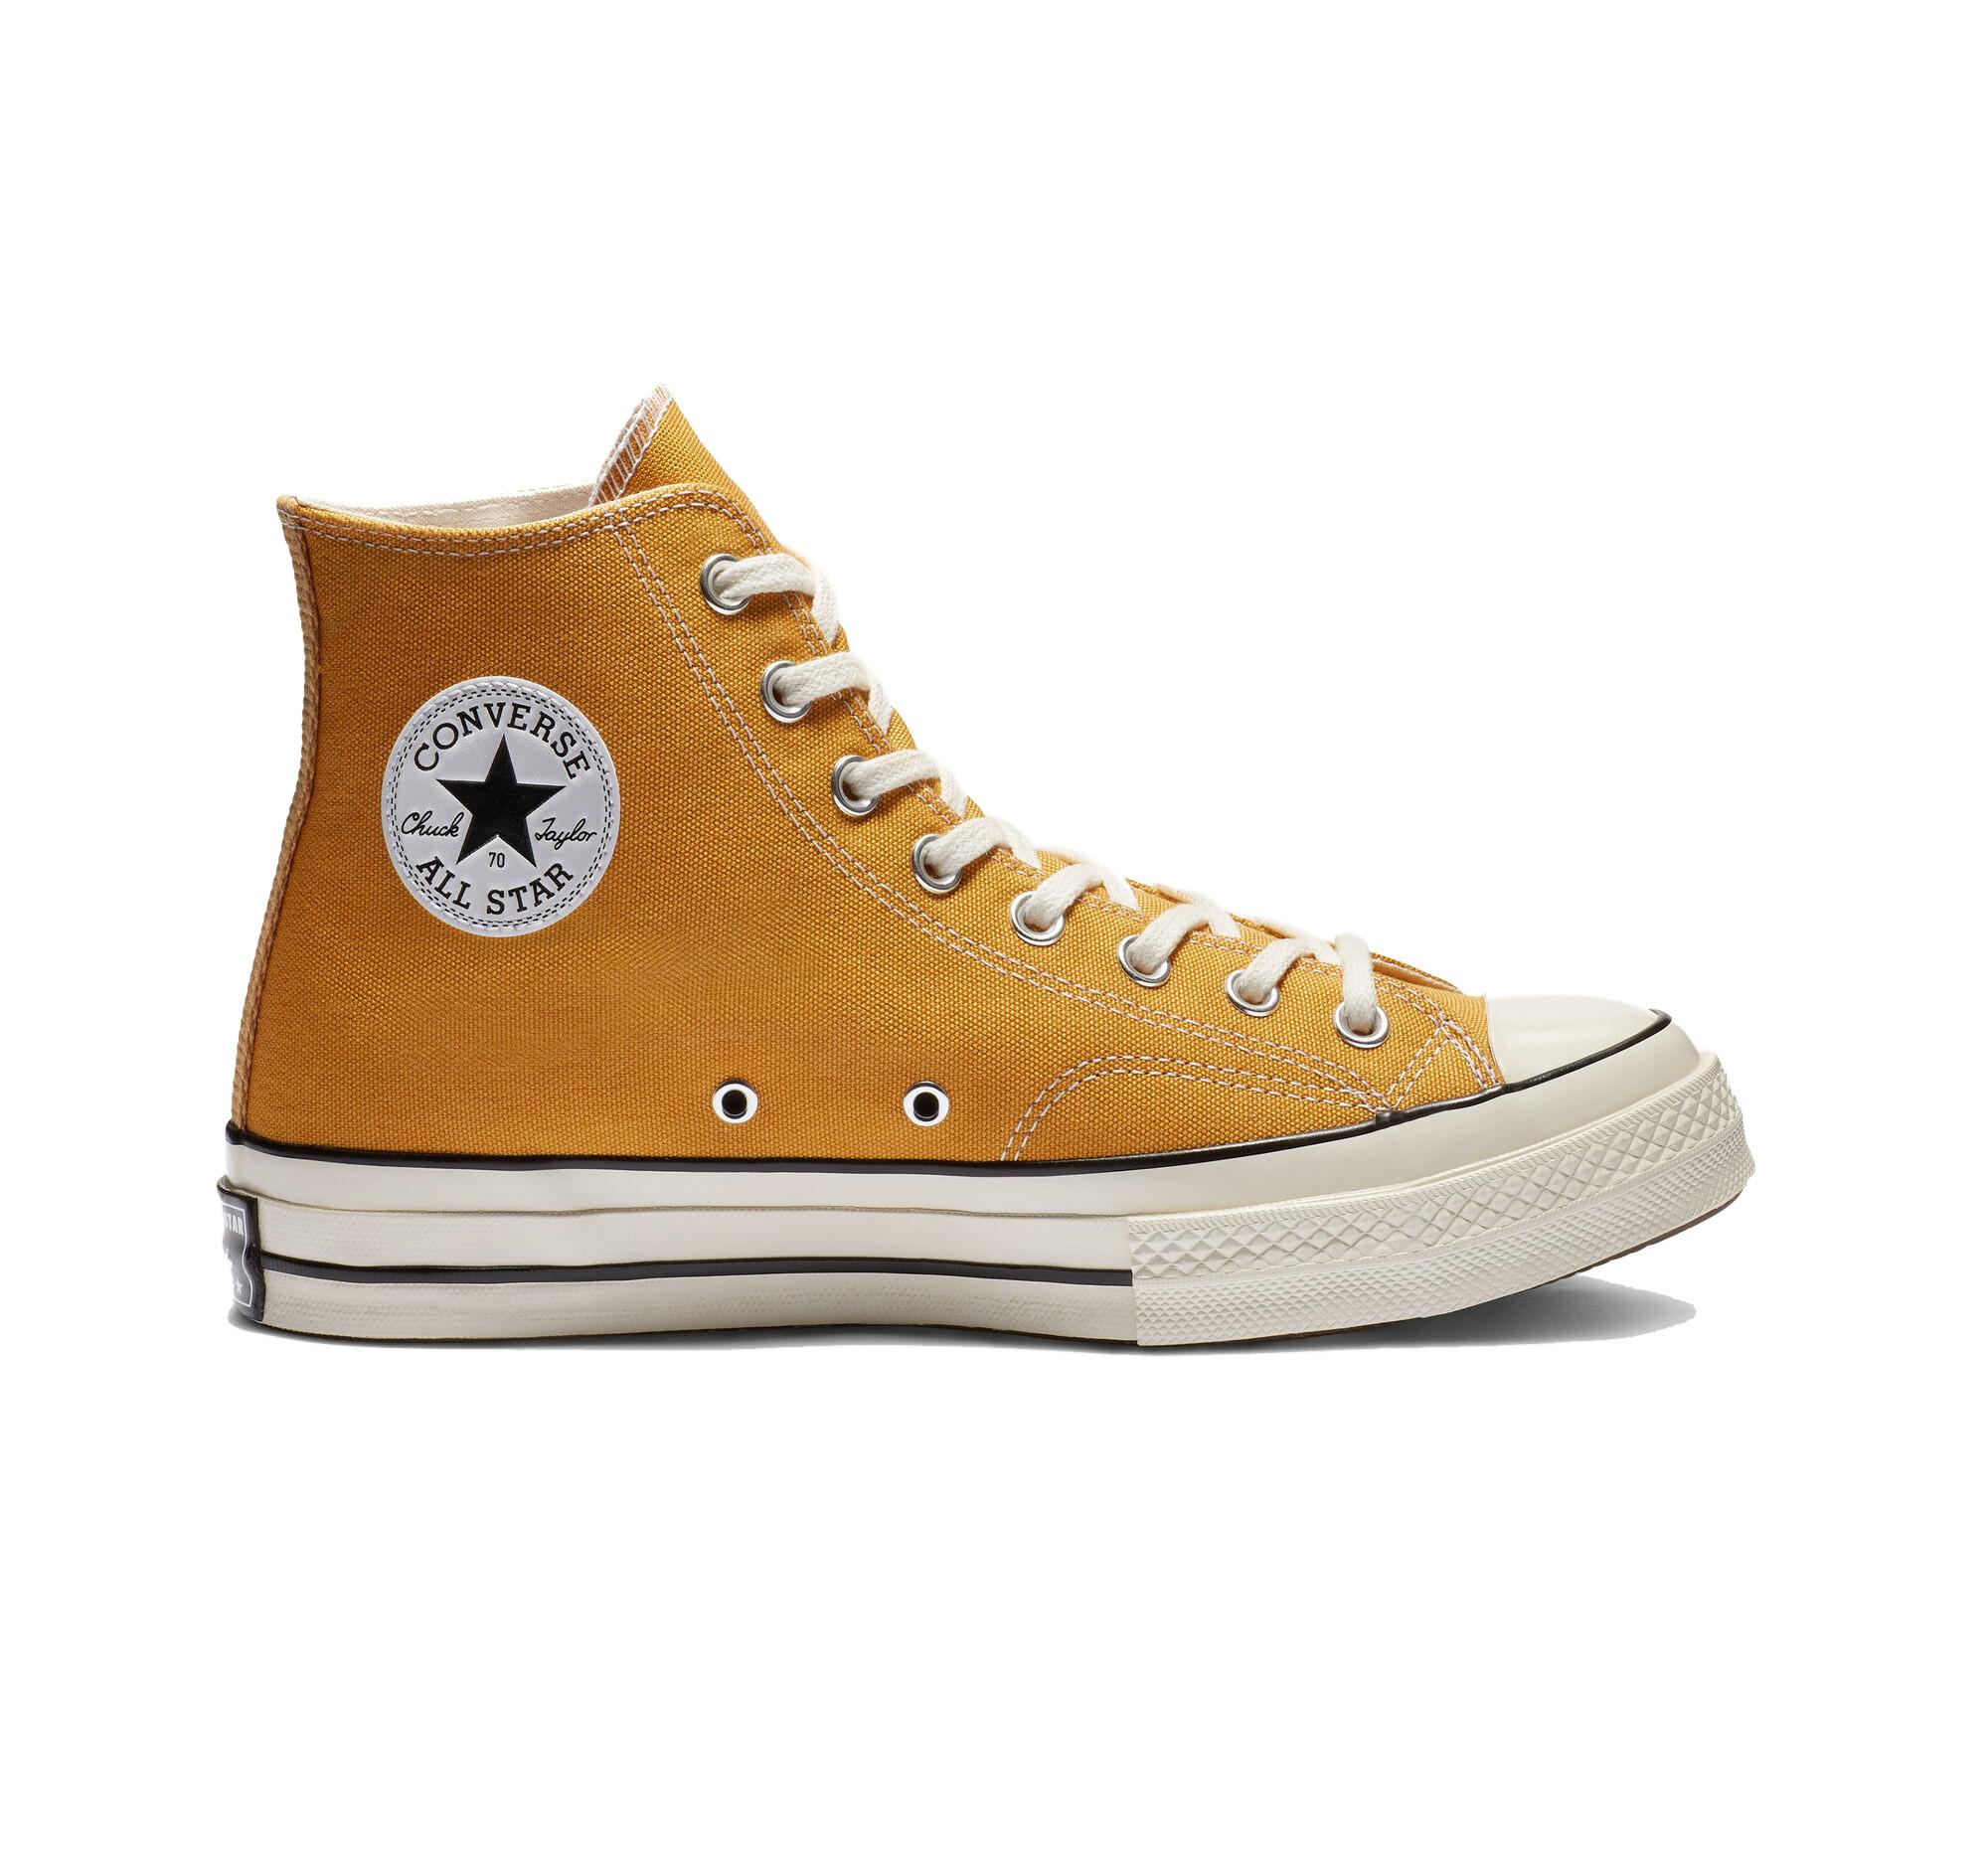 Converse Chuck 70 Hi - Sunflower/Black